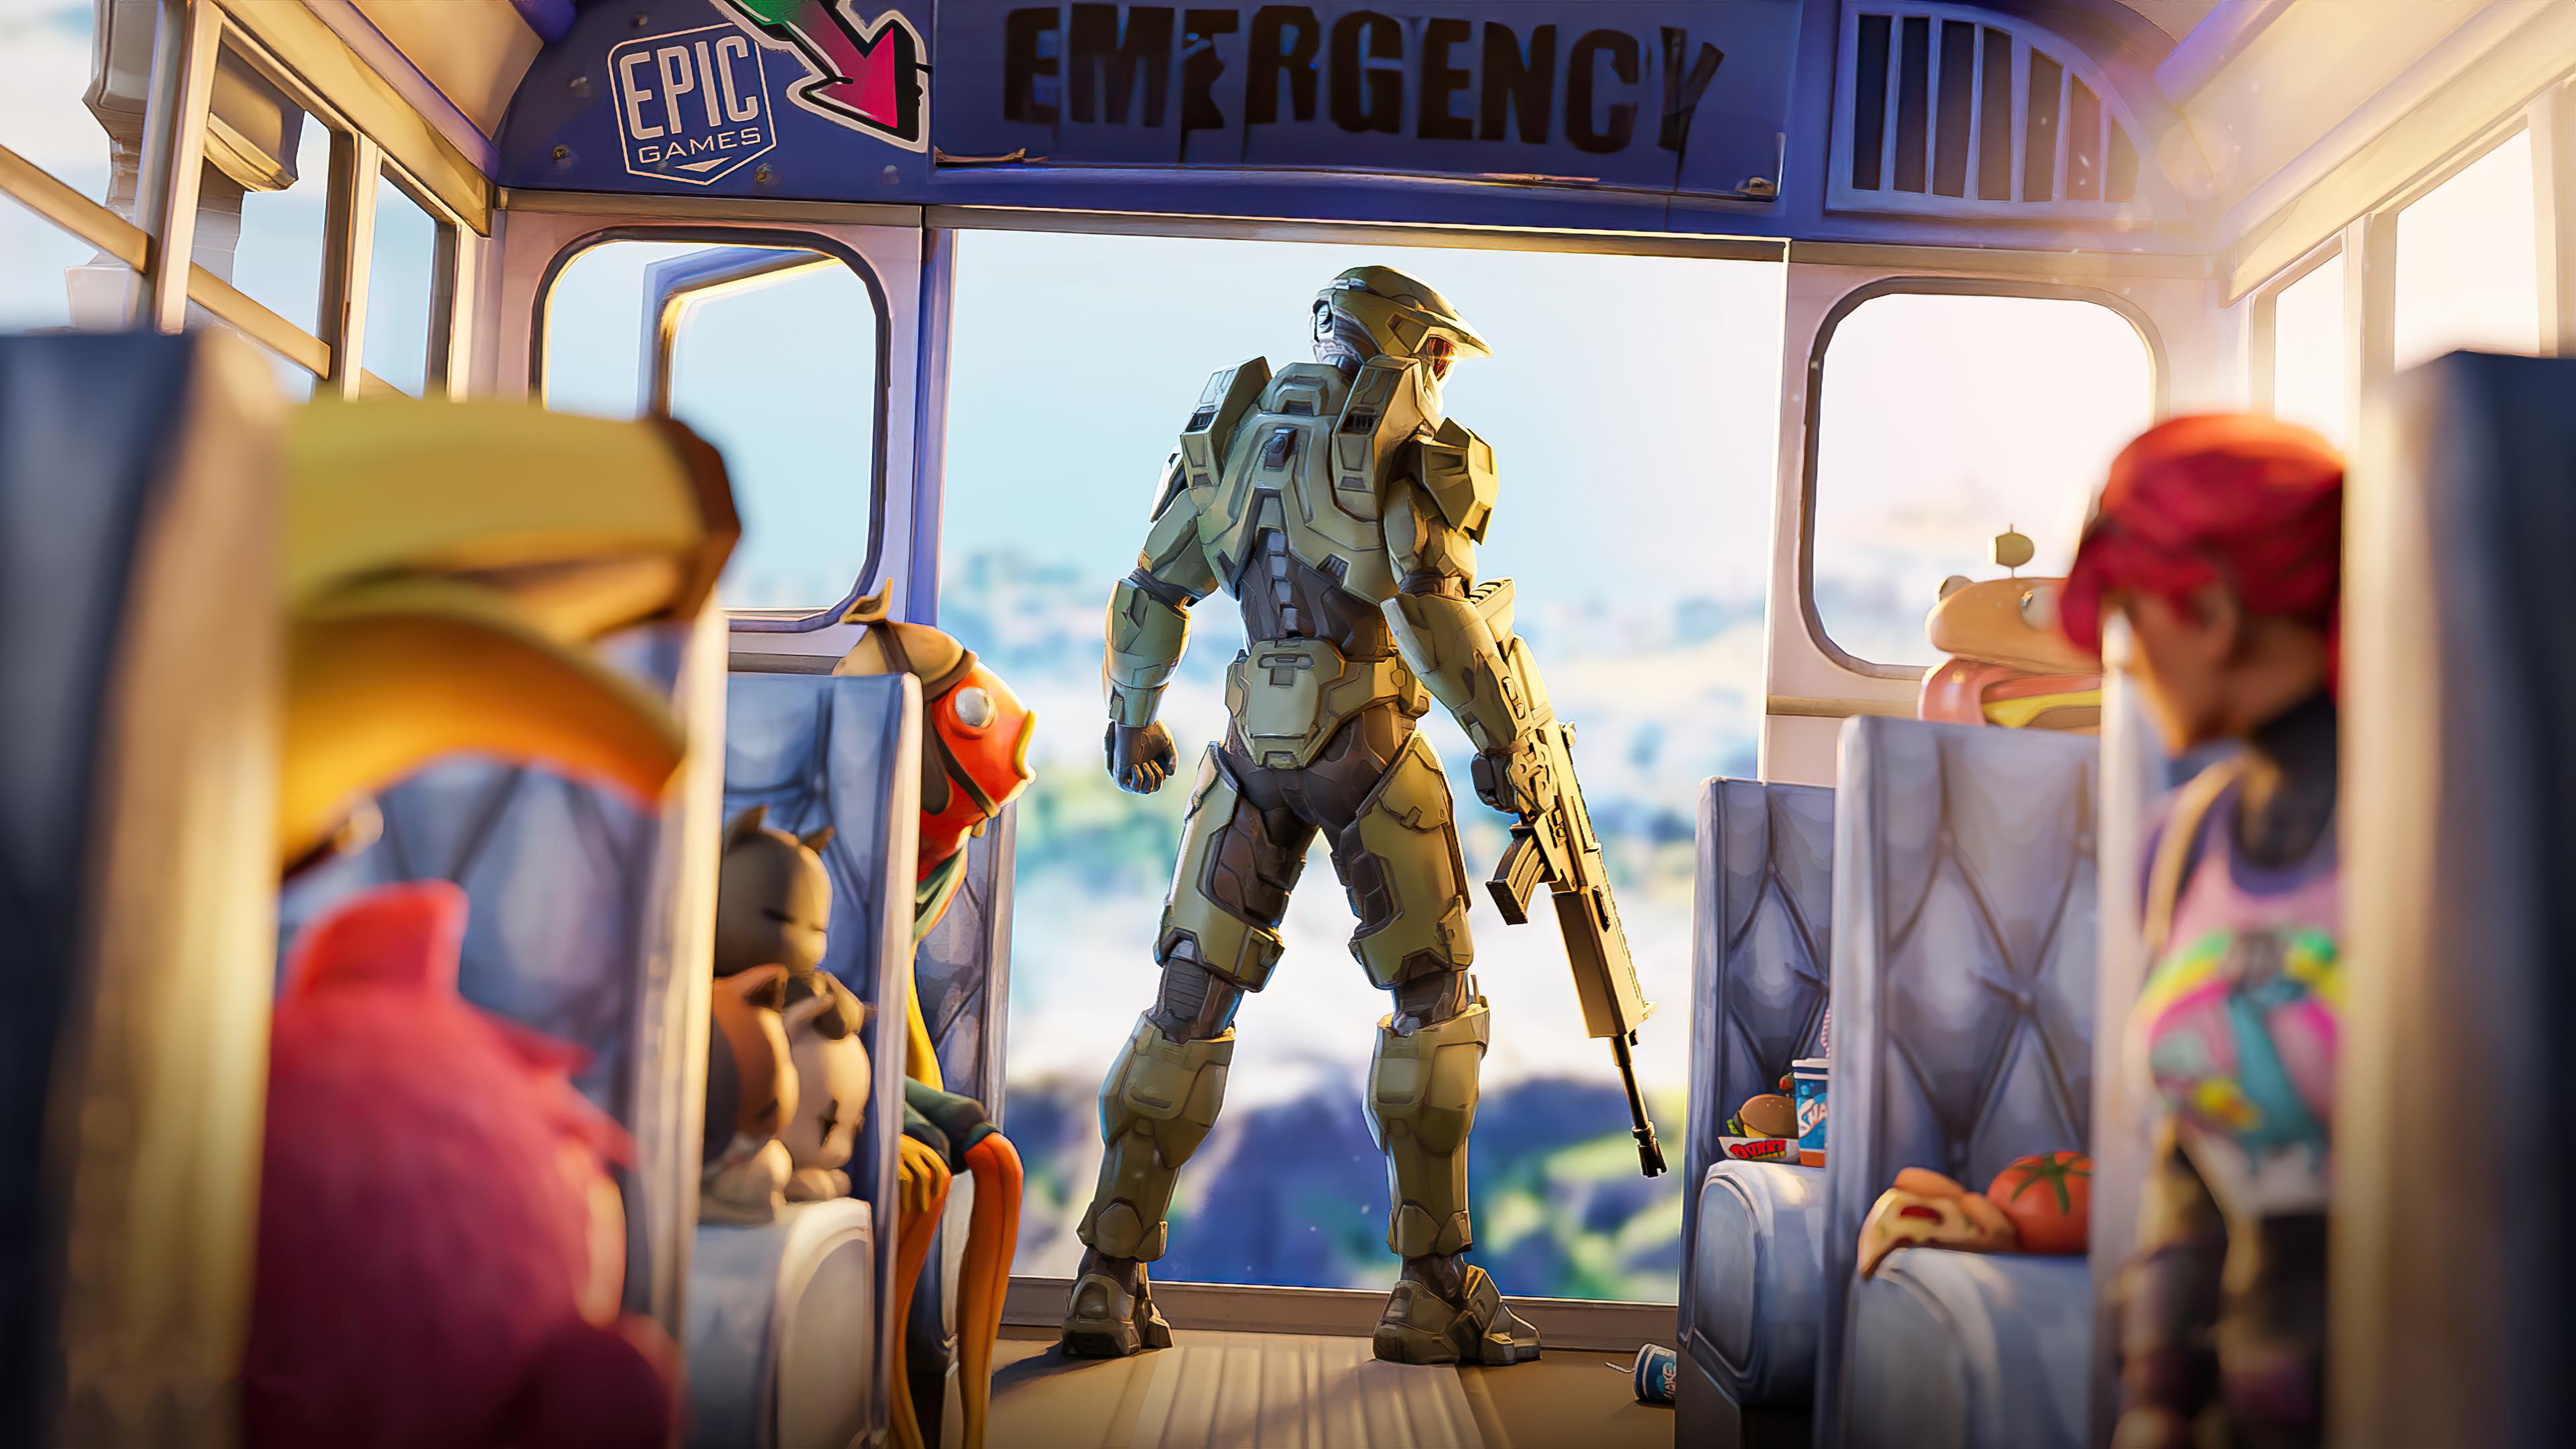 halo chief fortnite 4k 1615185549 - Halo Chief Fortnite 4k - Halo Chief Fortnite 4k wallpapers